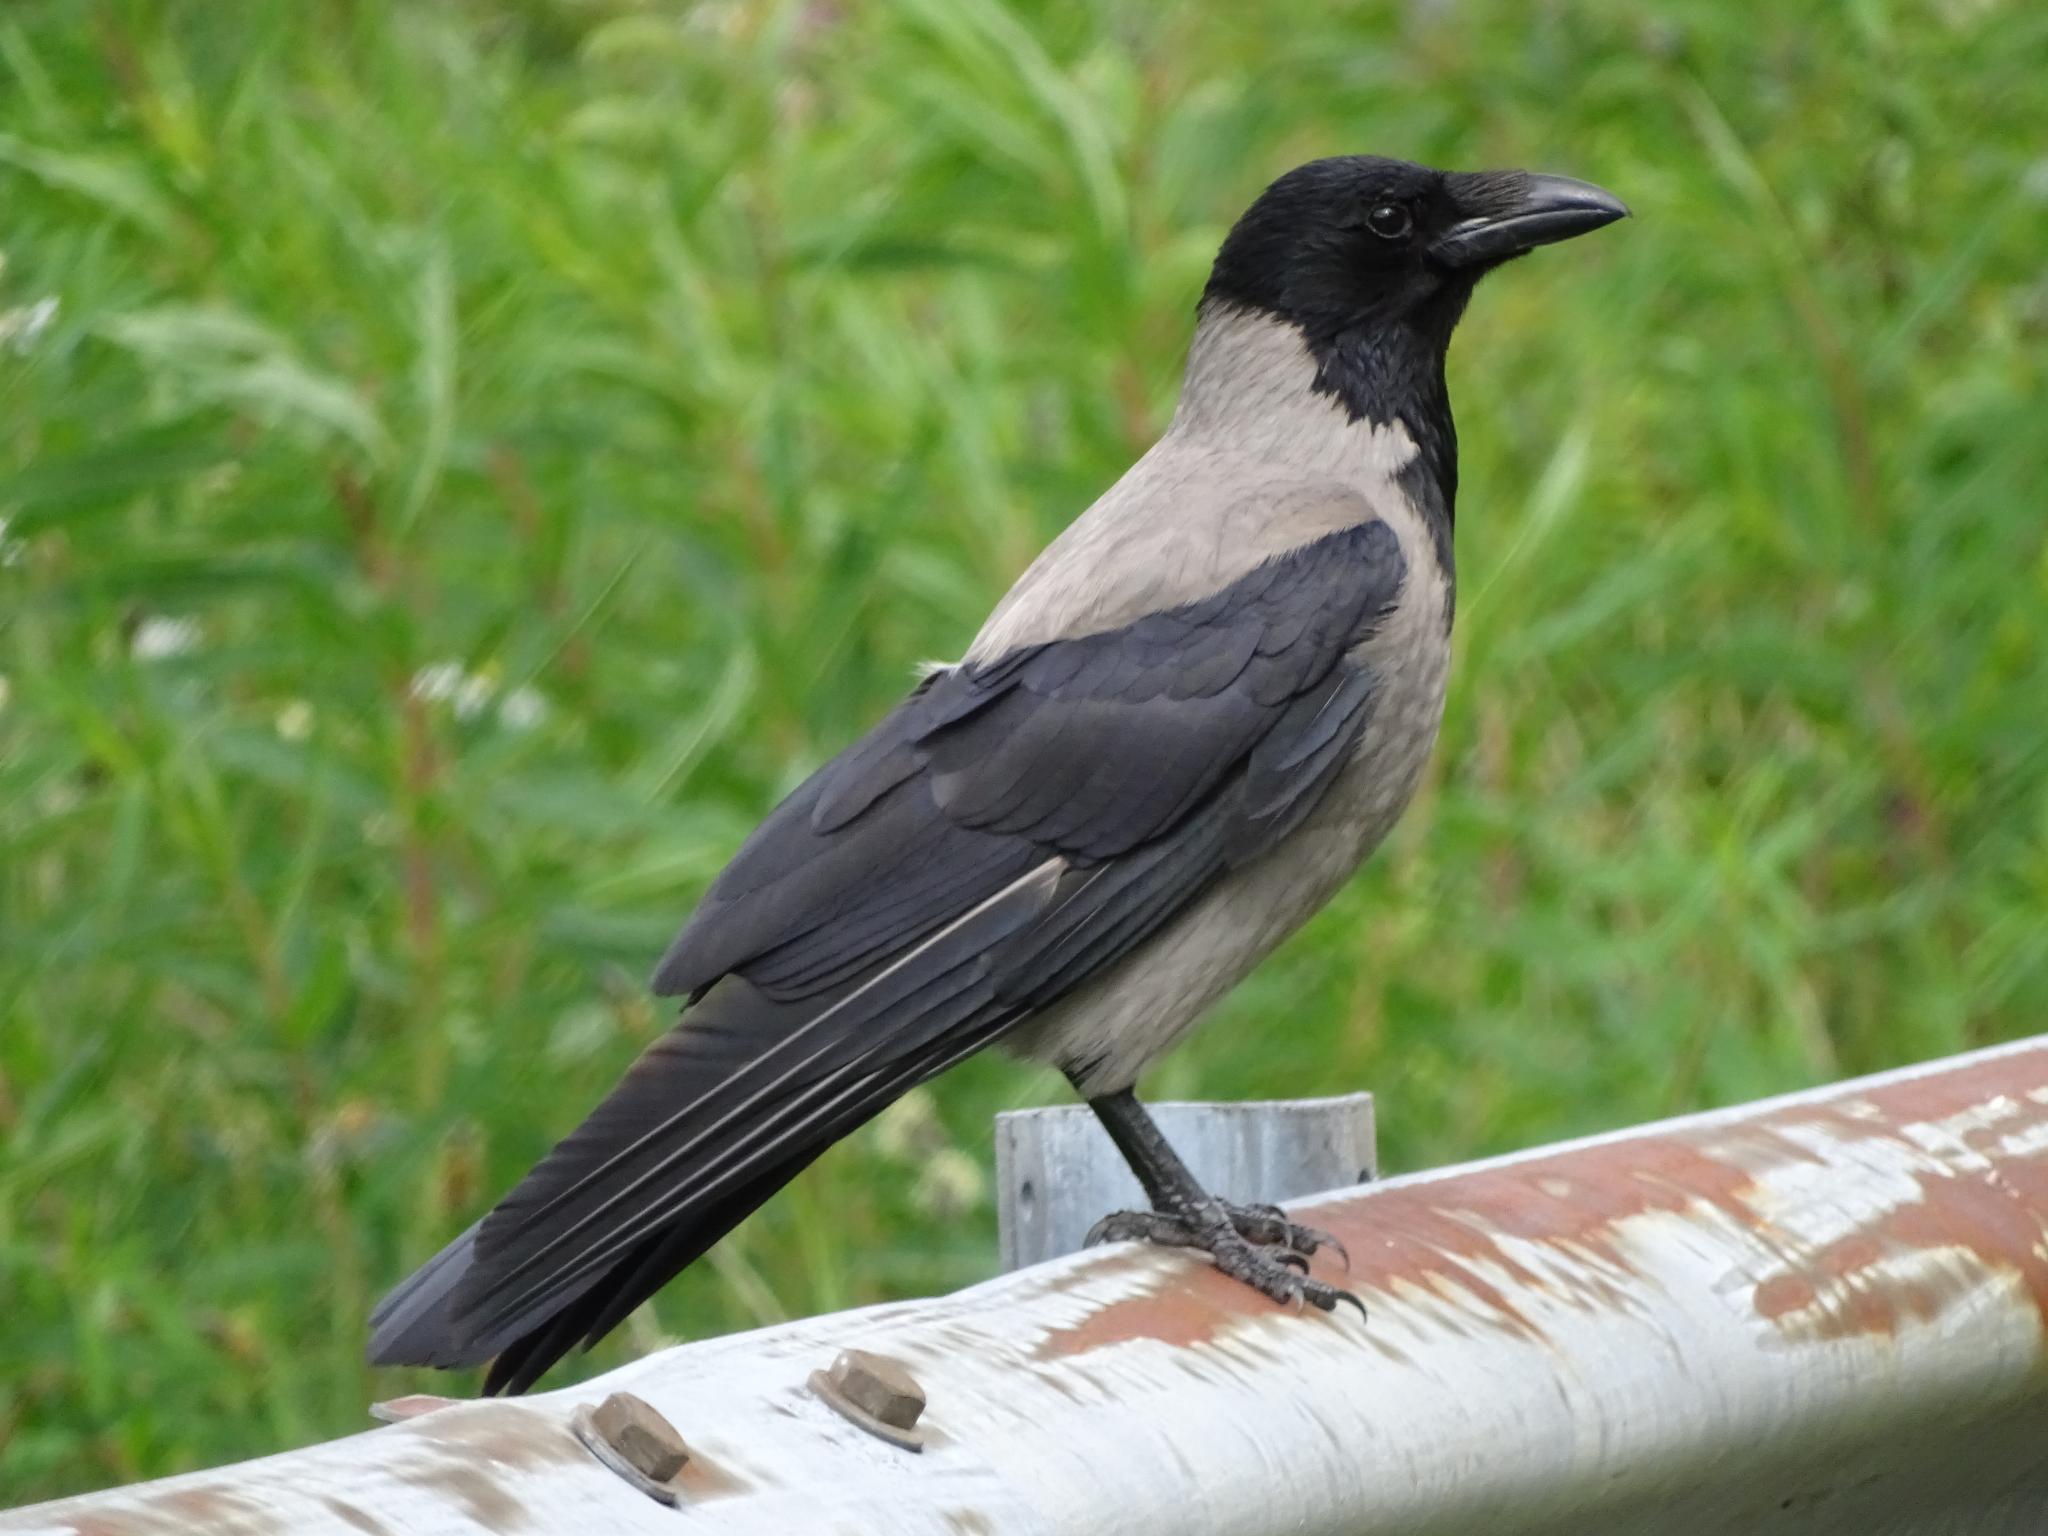 Hooded crow by jane.blackburn.58